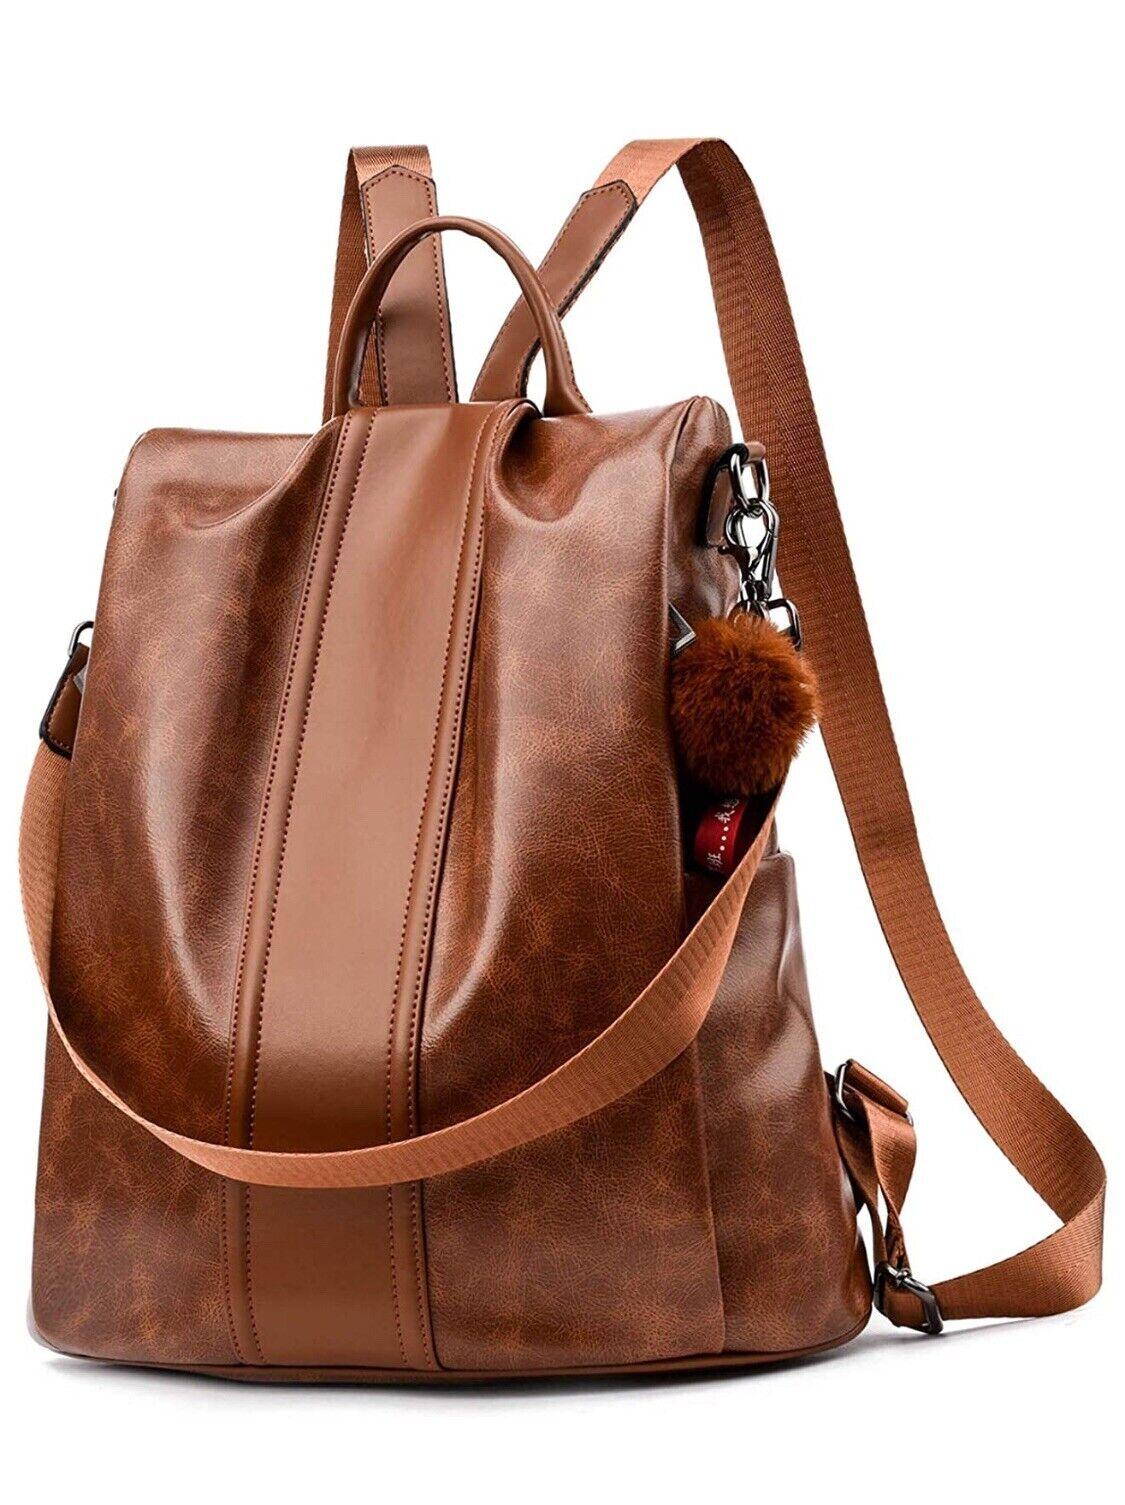 MING REN Shoulder Bag-PU//Polyester Fashion Cartoon Cute Joker Zipper Print Shoulder Crossbody Casual Lady Small Square Bag-21.5x11.5x17.5cm Handbags for Women